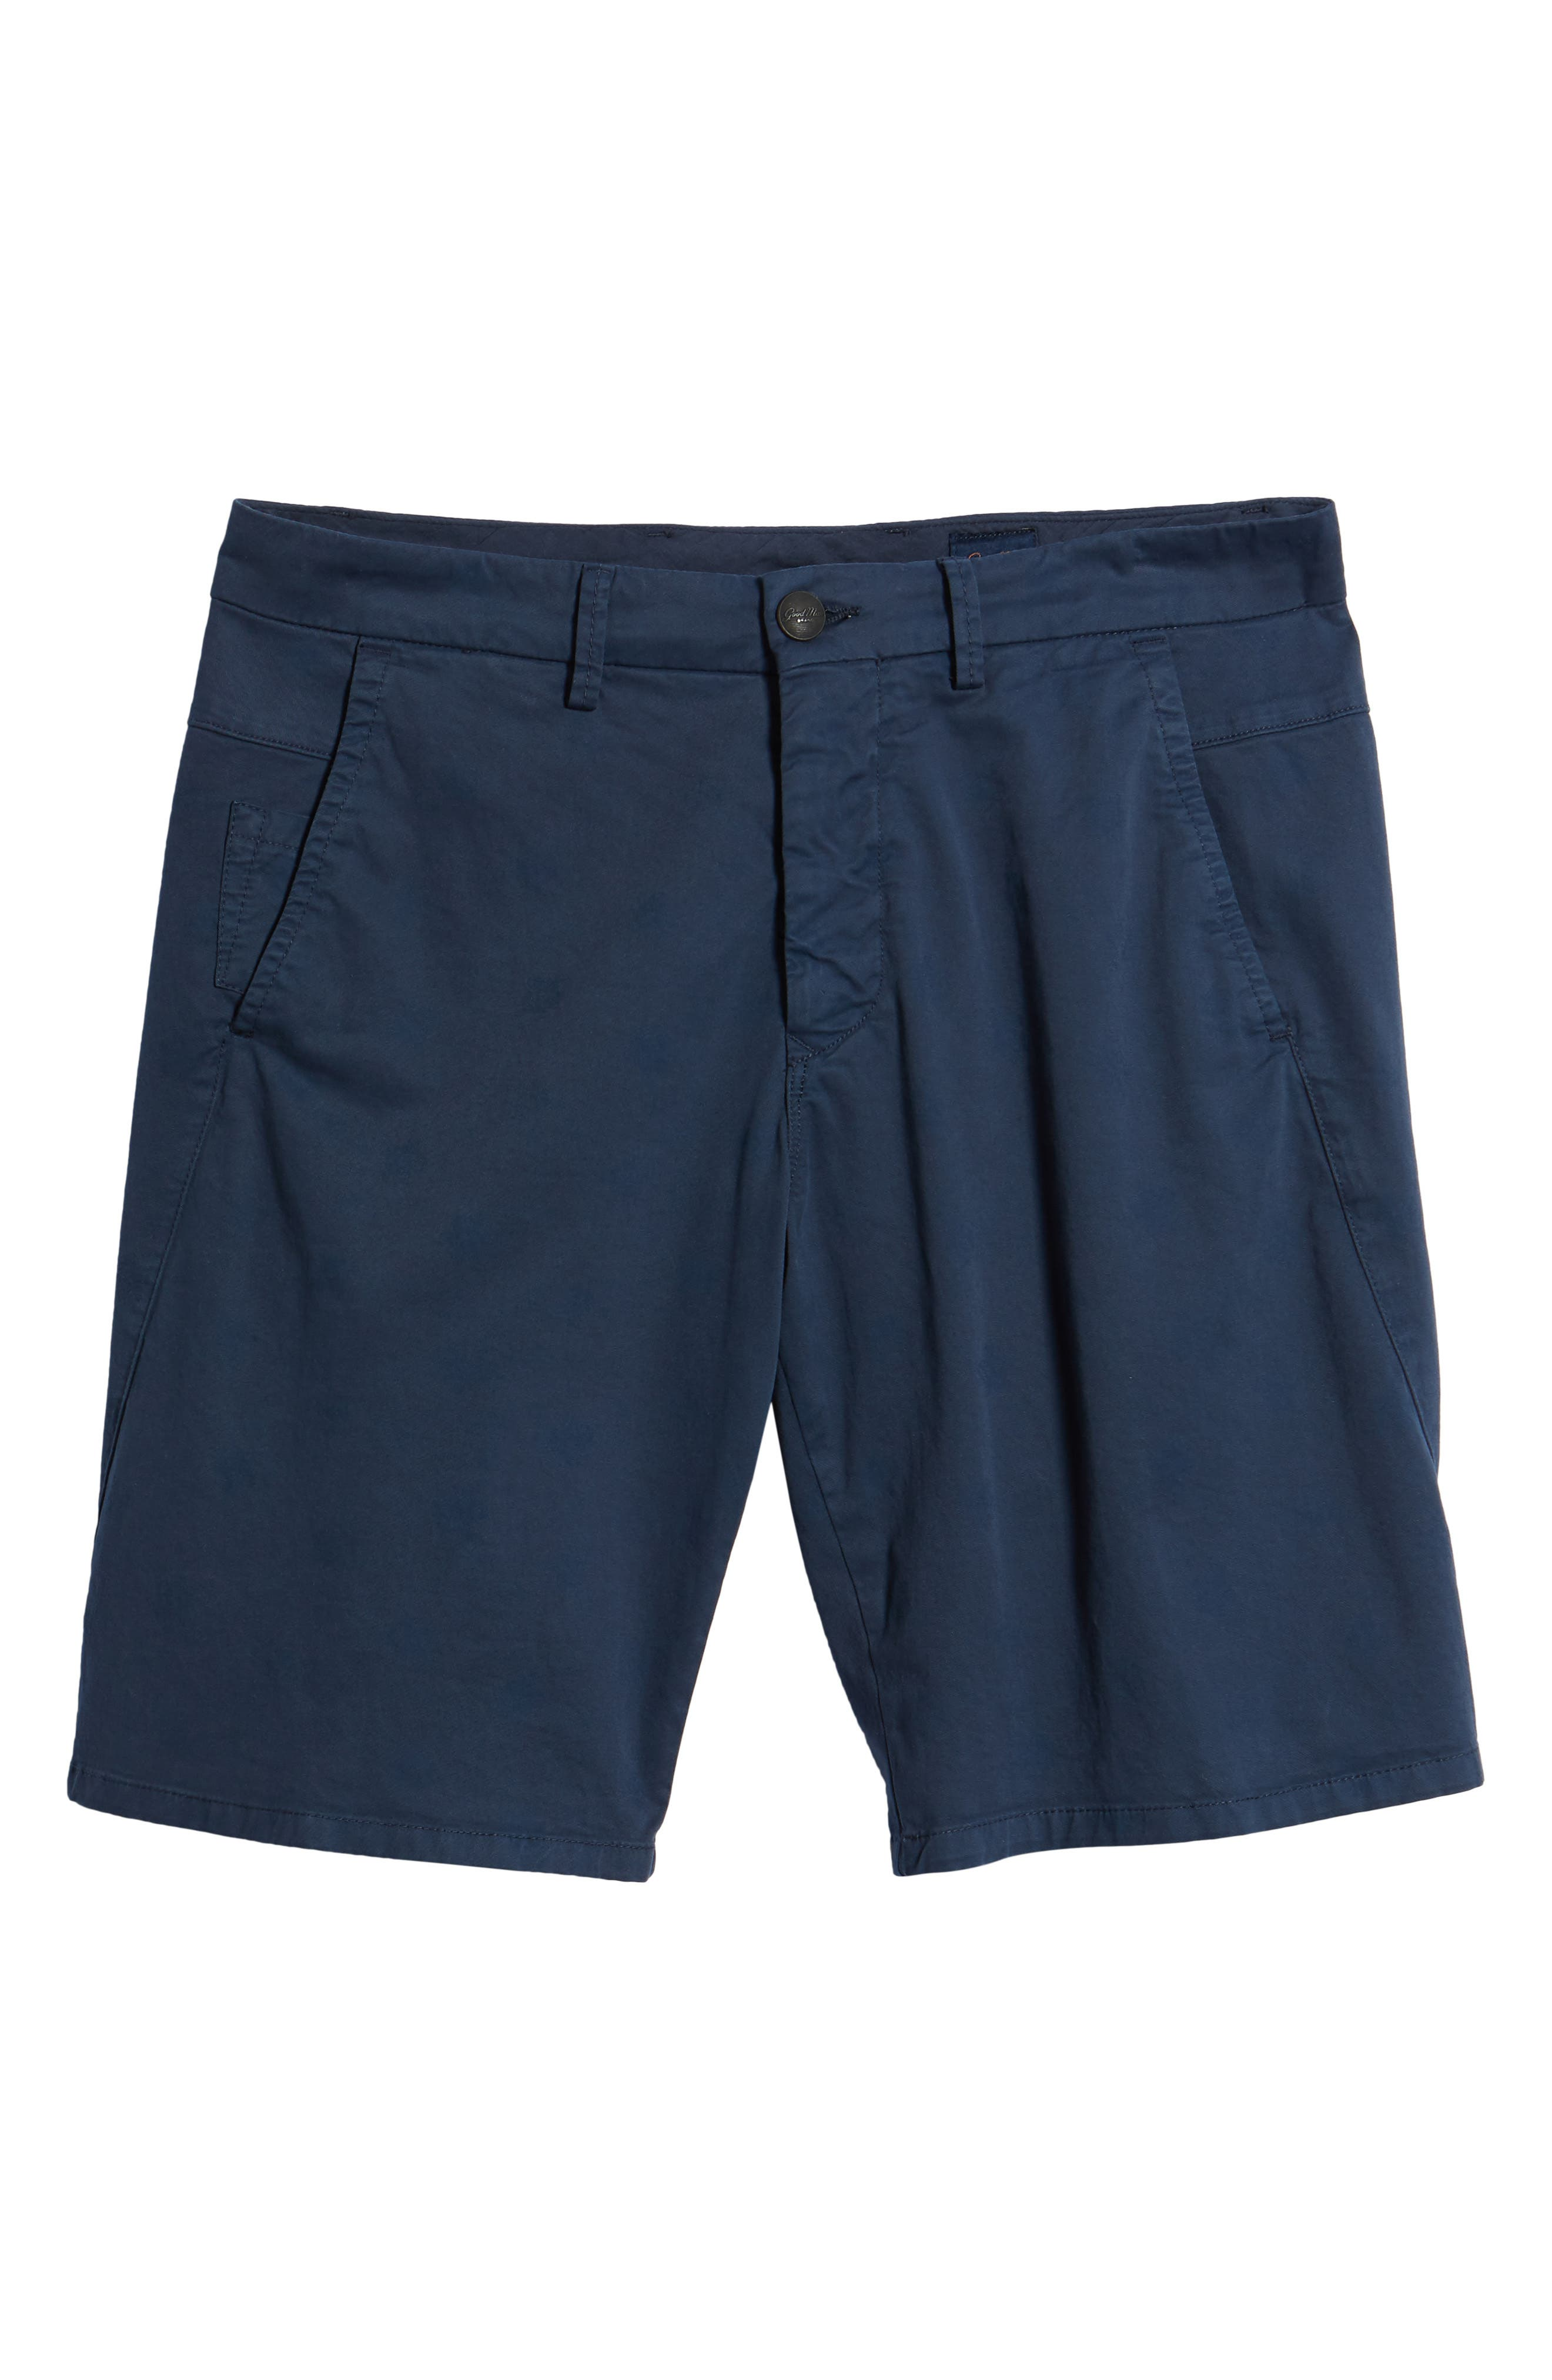 Monaco Floral Stretch Shorts,                         Main,                         color, Indigo